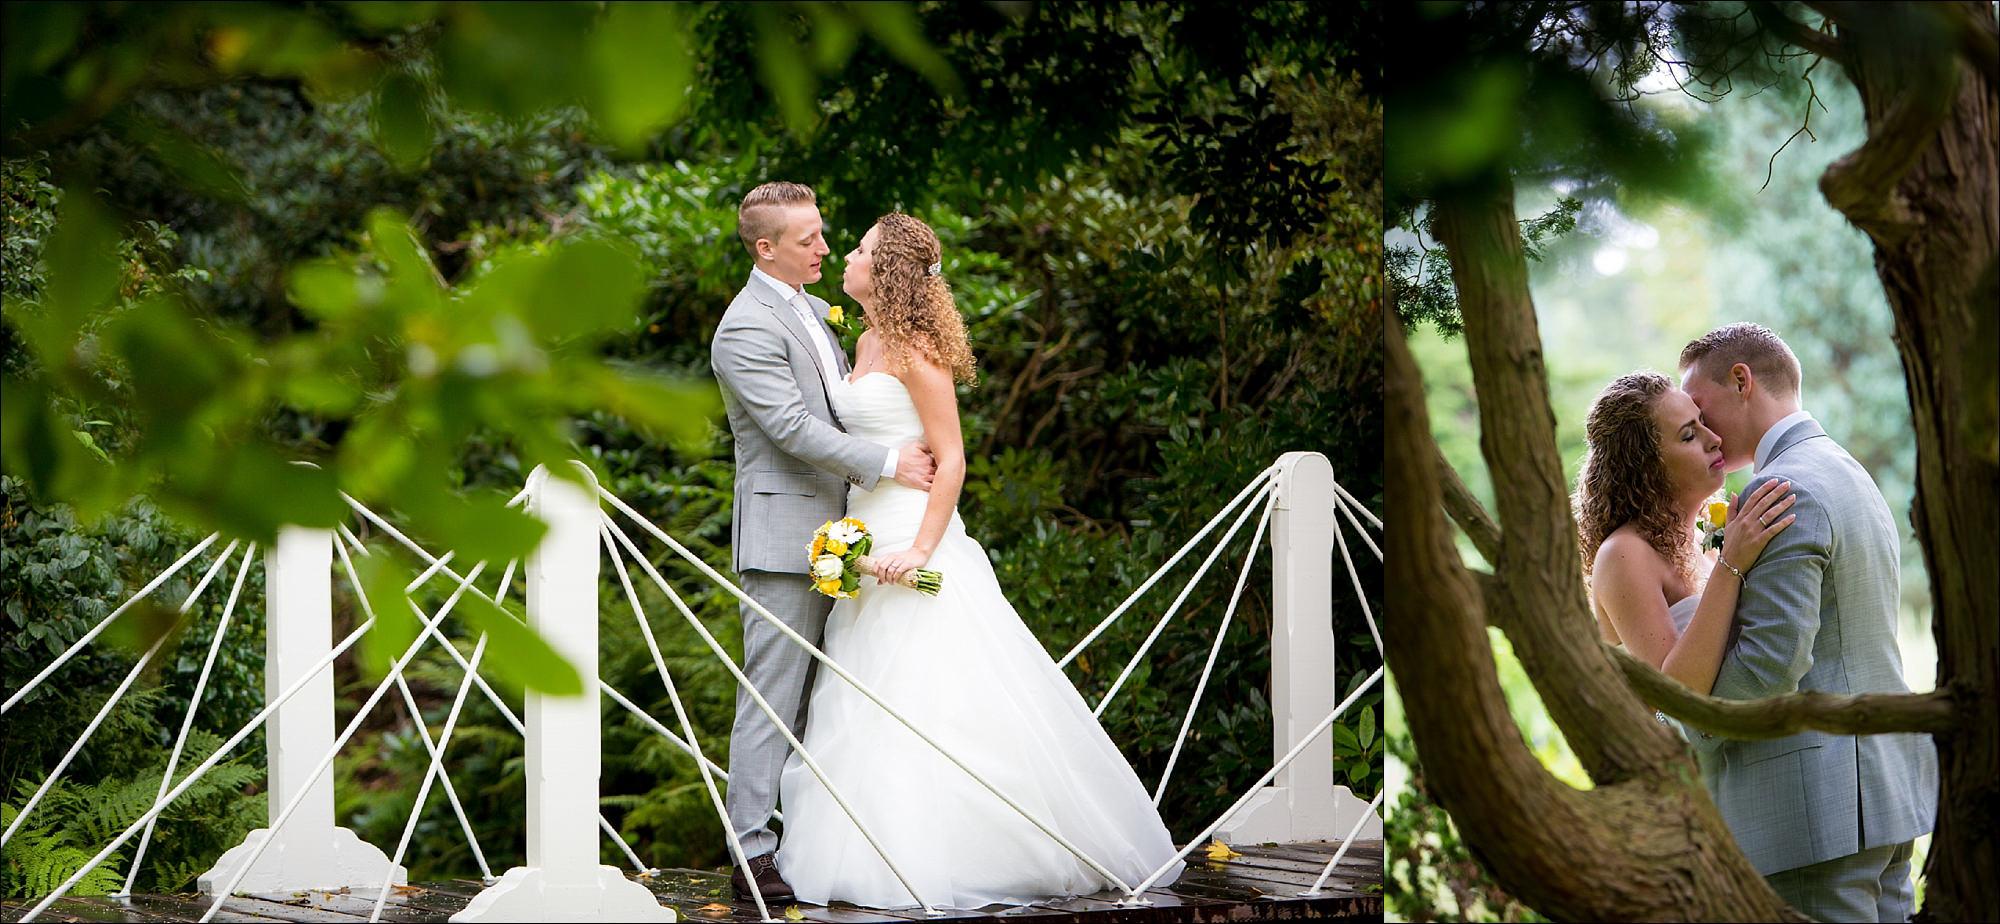 best dublin wedding photographers david duignan photography leinster weddings Ireland 0034